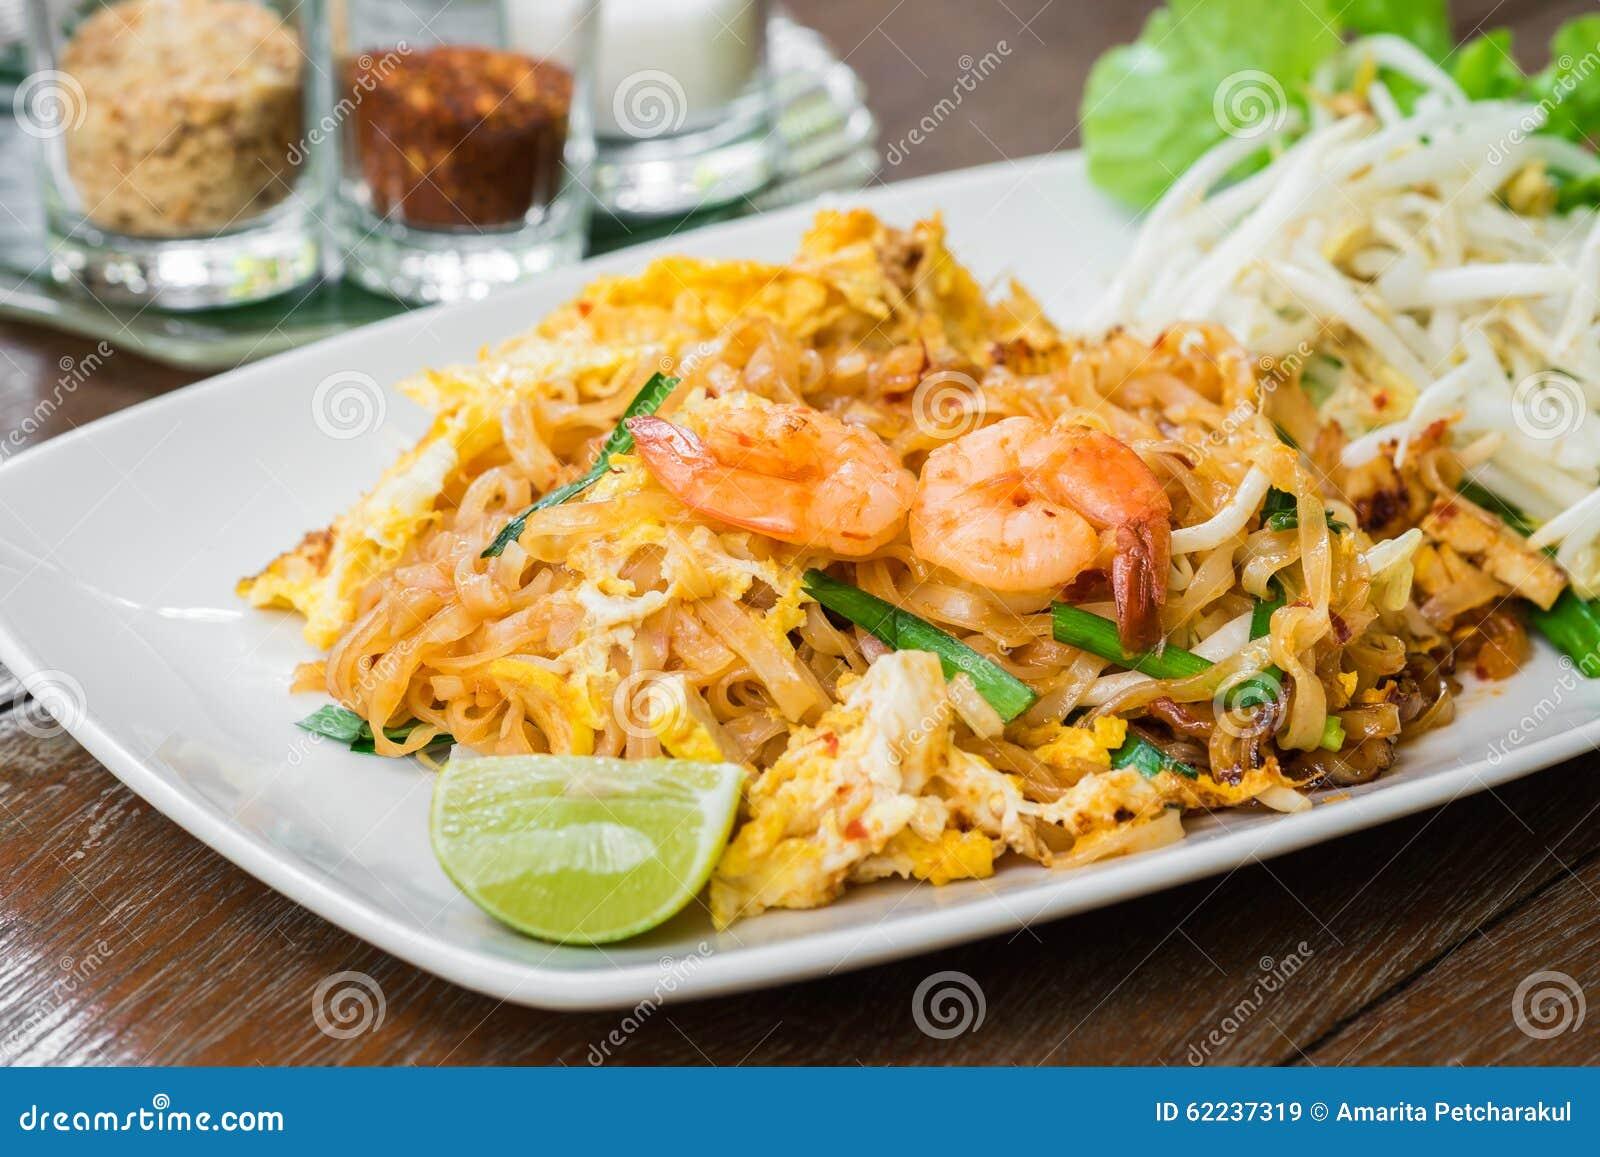 stir-fried-rice-noodles-shrimp-pad-thai-thai-food-style-62237319.jpg